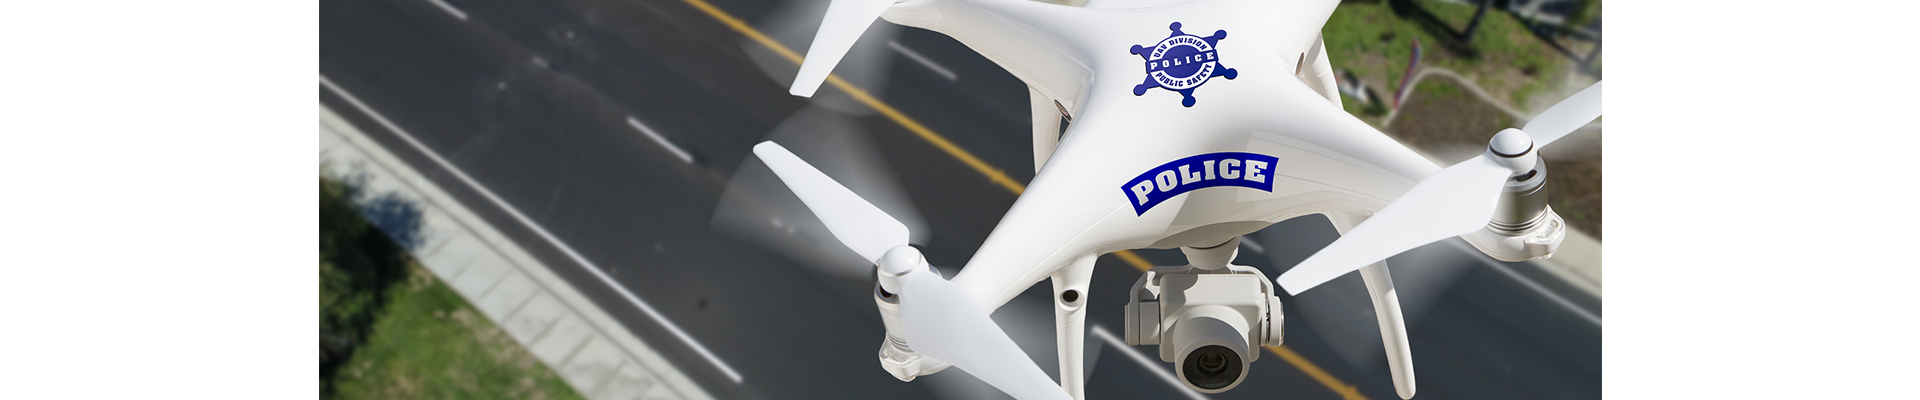 O drona a devenit cheia unei urmariri ale politiei